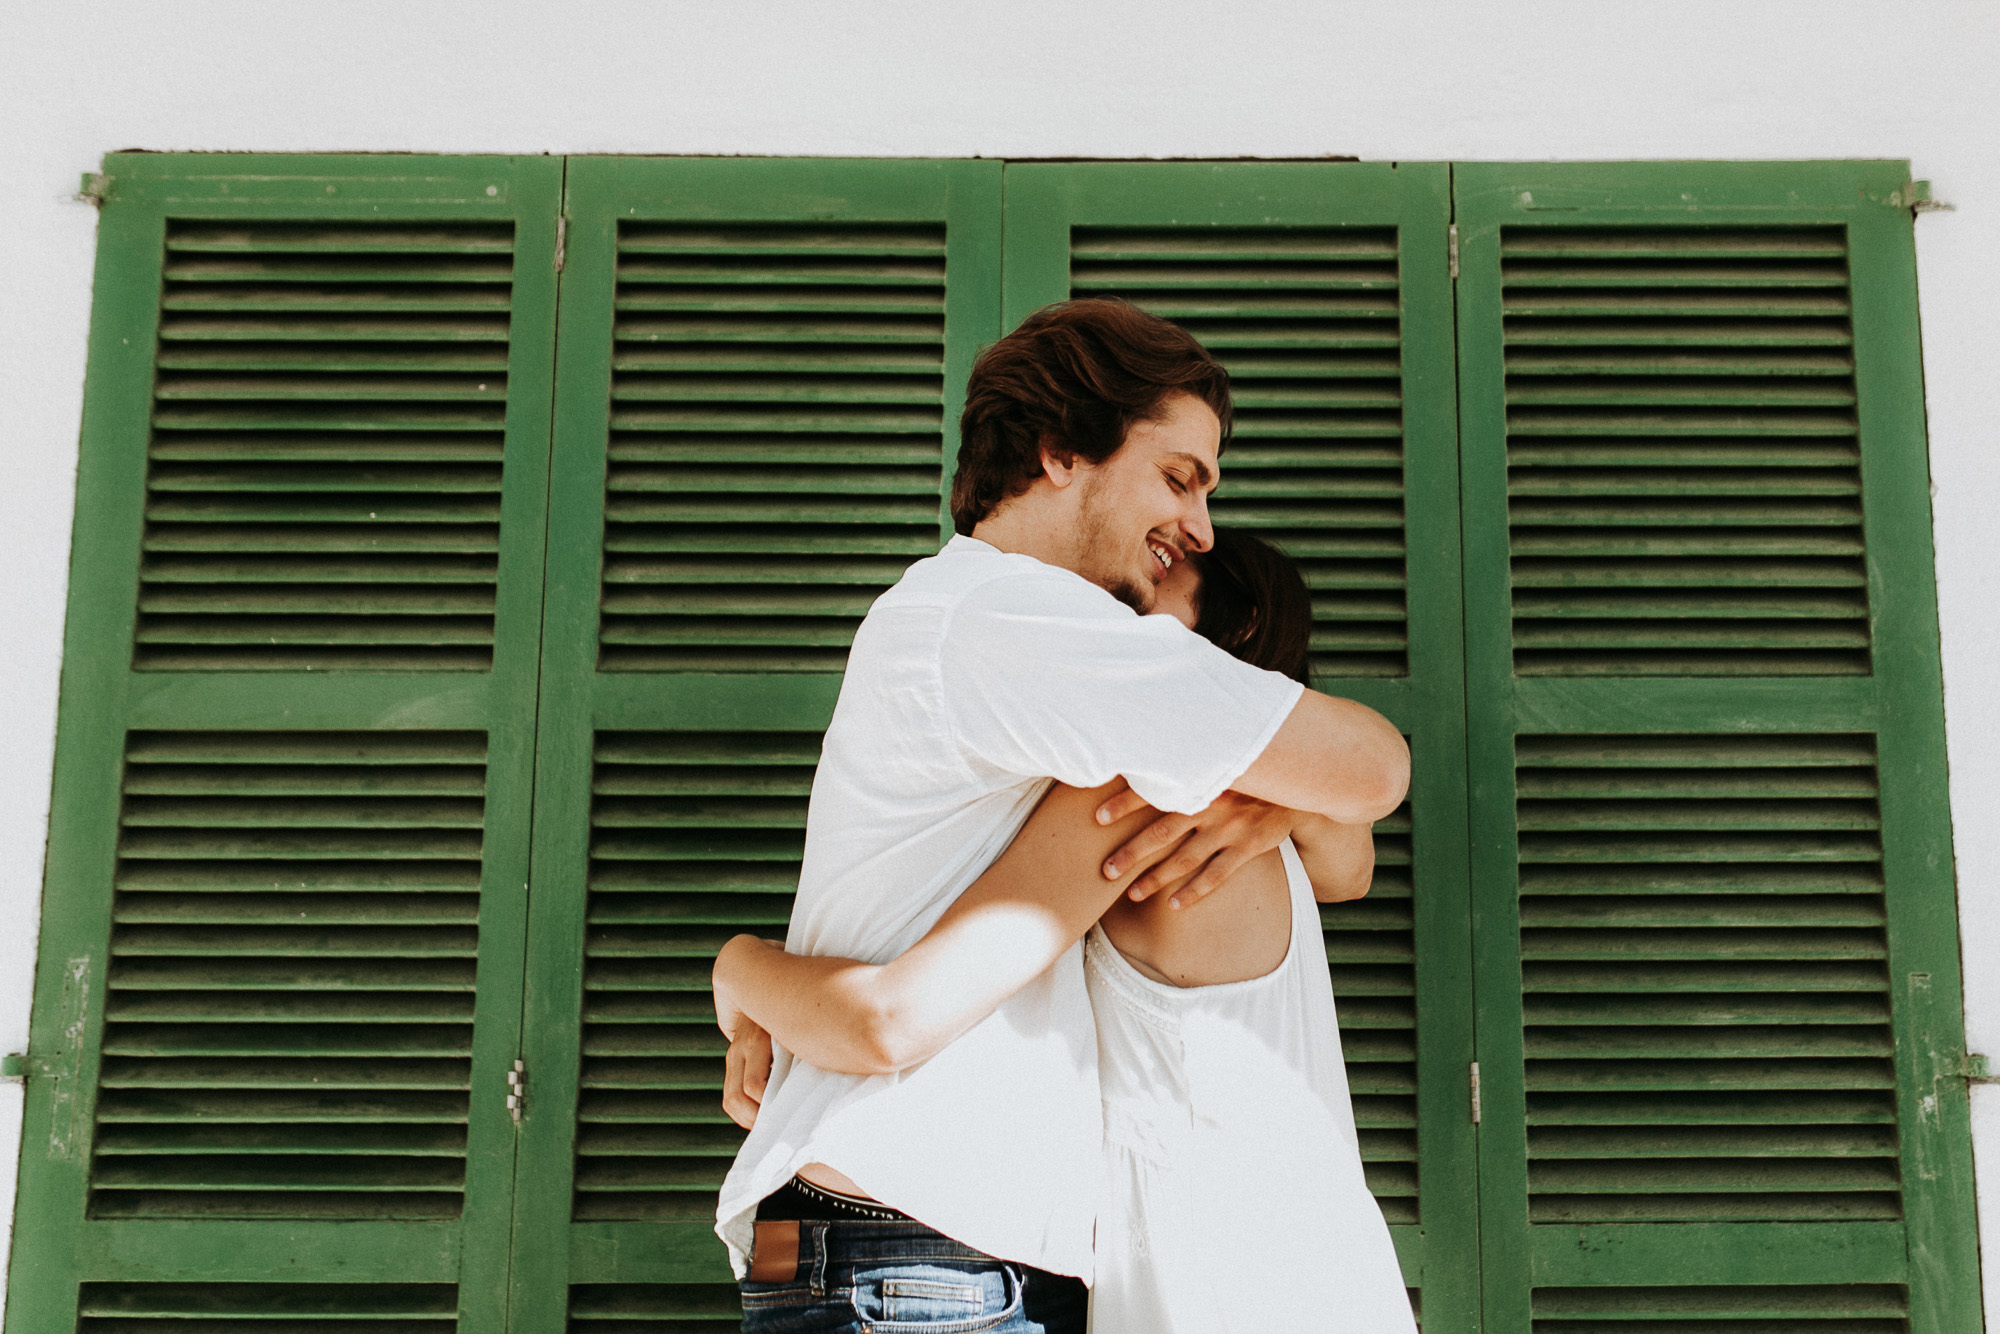 DanielaMarquardtPhotography_wedding_elopement_mallorca_spain_stjordi_sessalines_marinaandxavi456